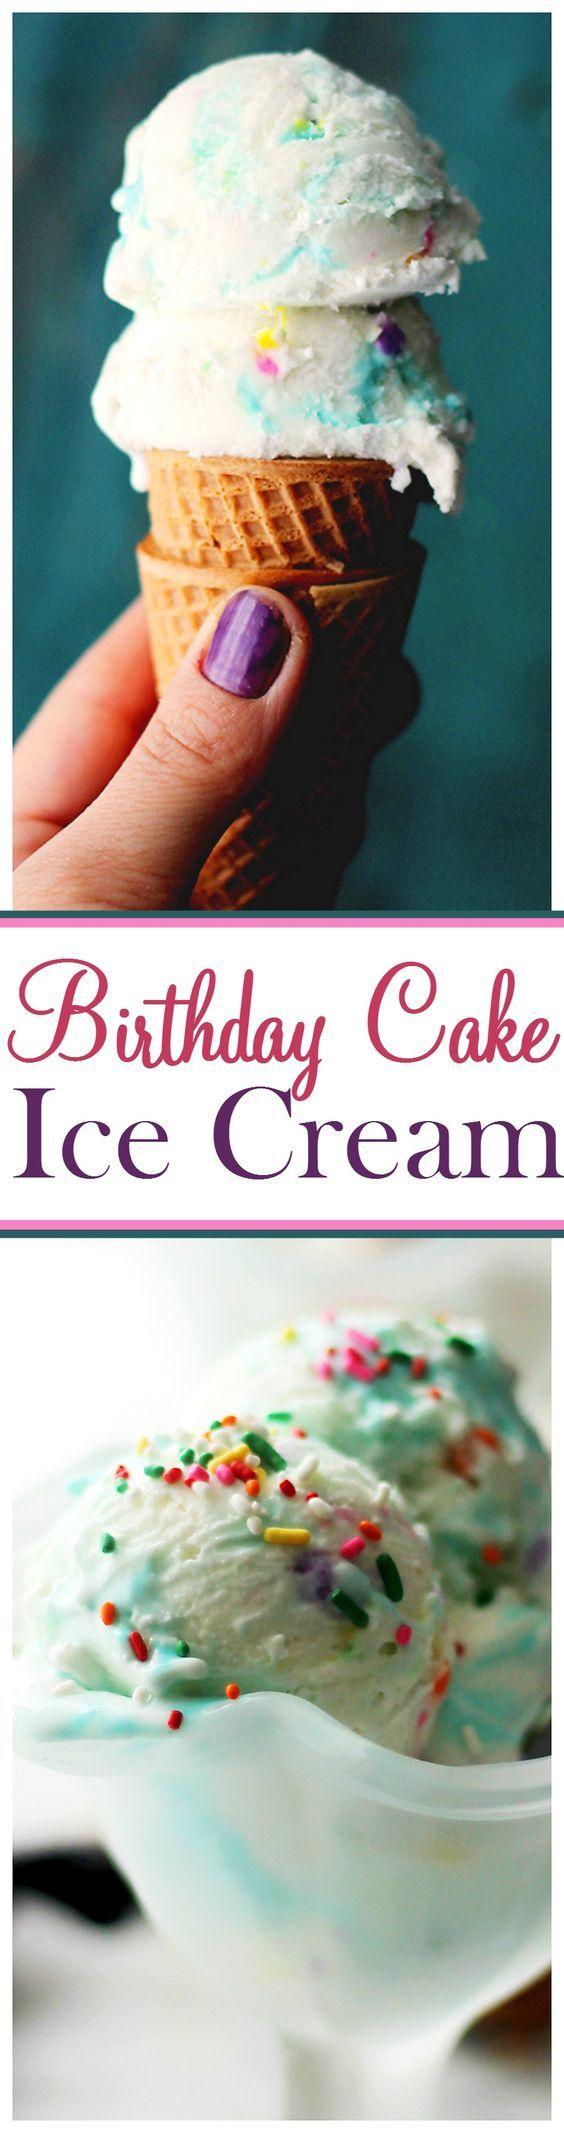 Birthday Cake Ice Cream Recipe Birthday cake ice cream